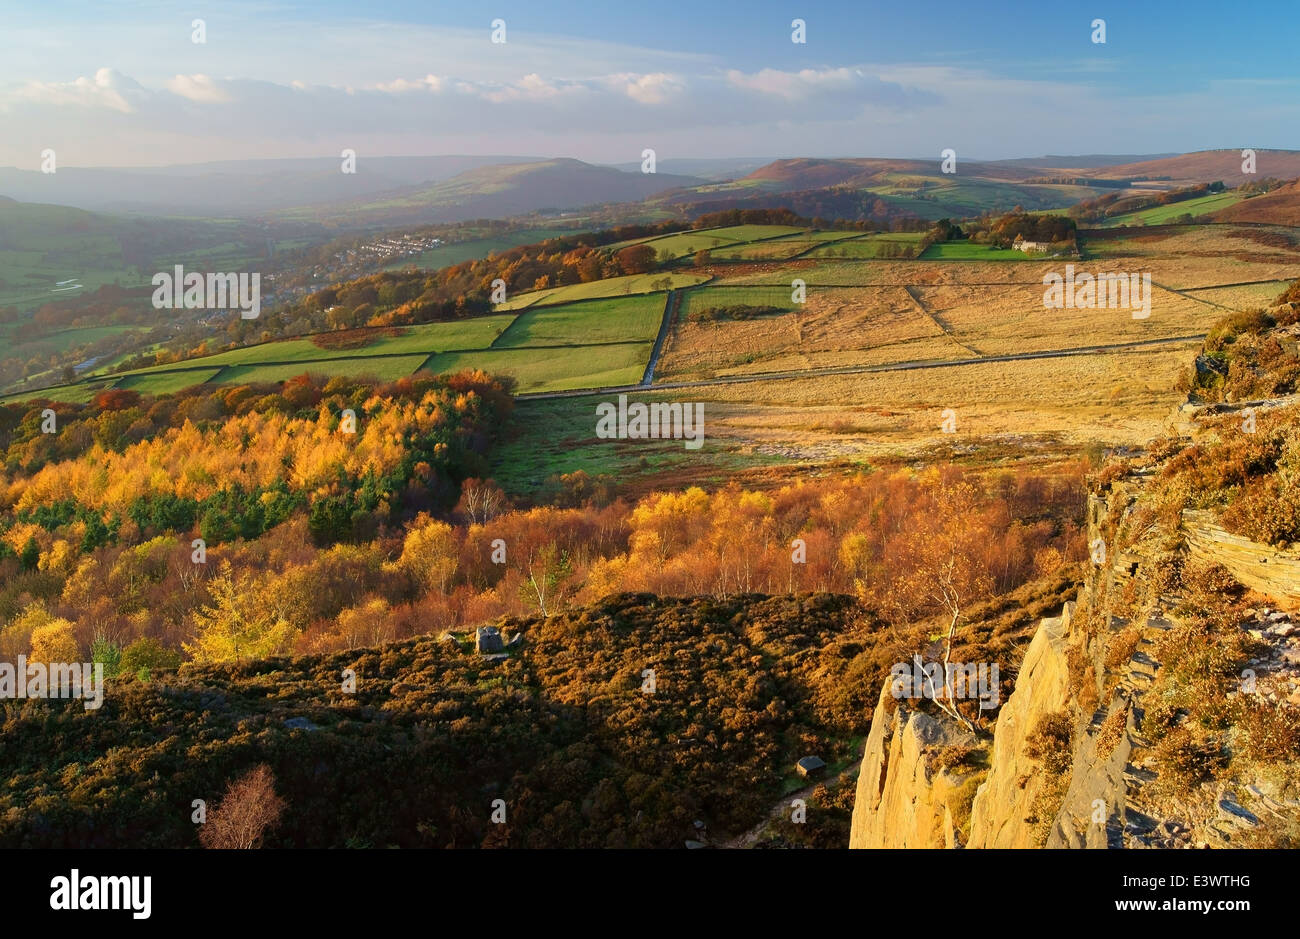 UK,Derbyshire,Peak District, Looking Towards Hathersage from Millstone Edge - Stock Image